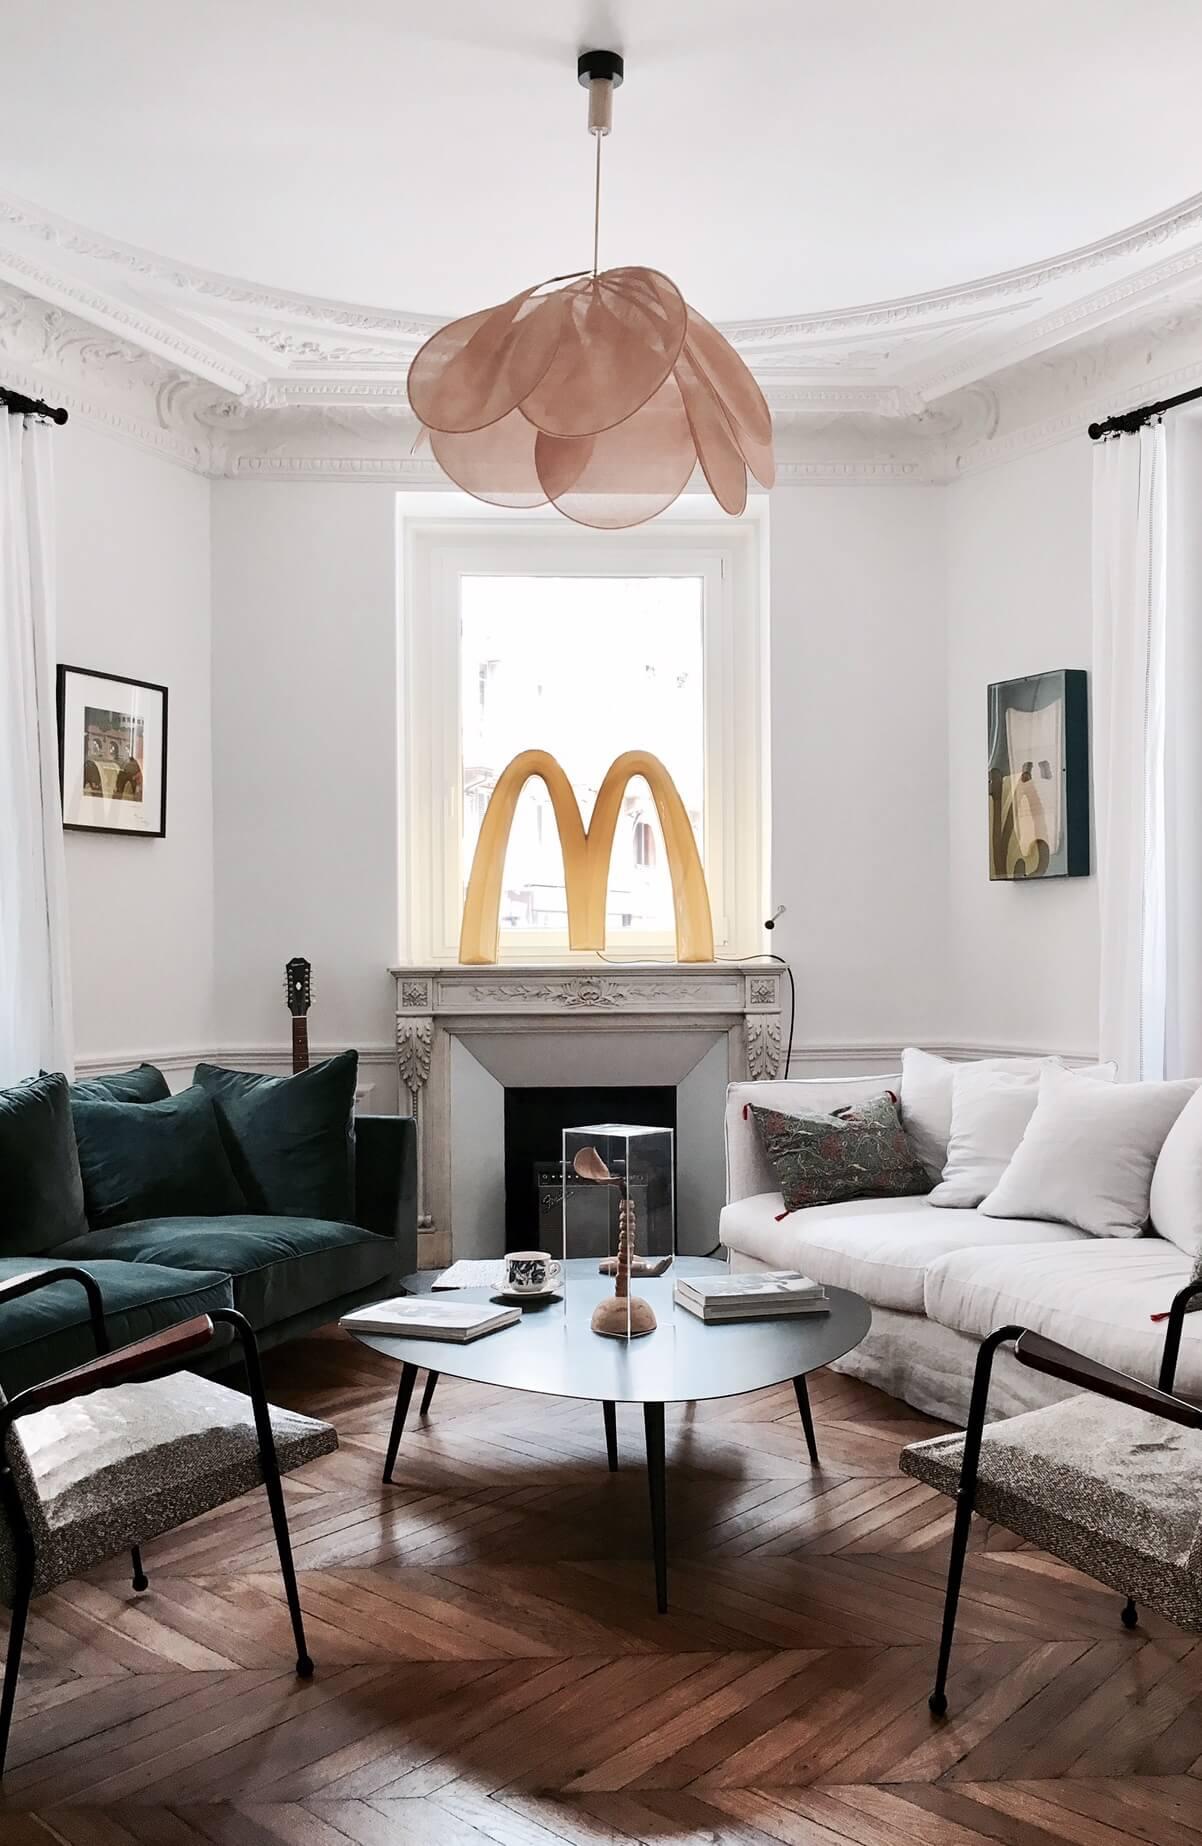 A dreamy family home in Paris